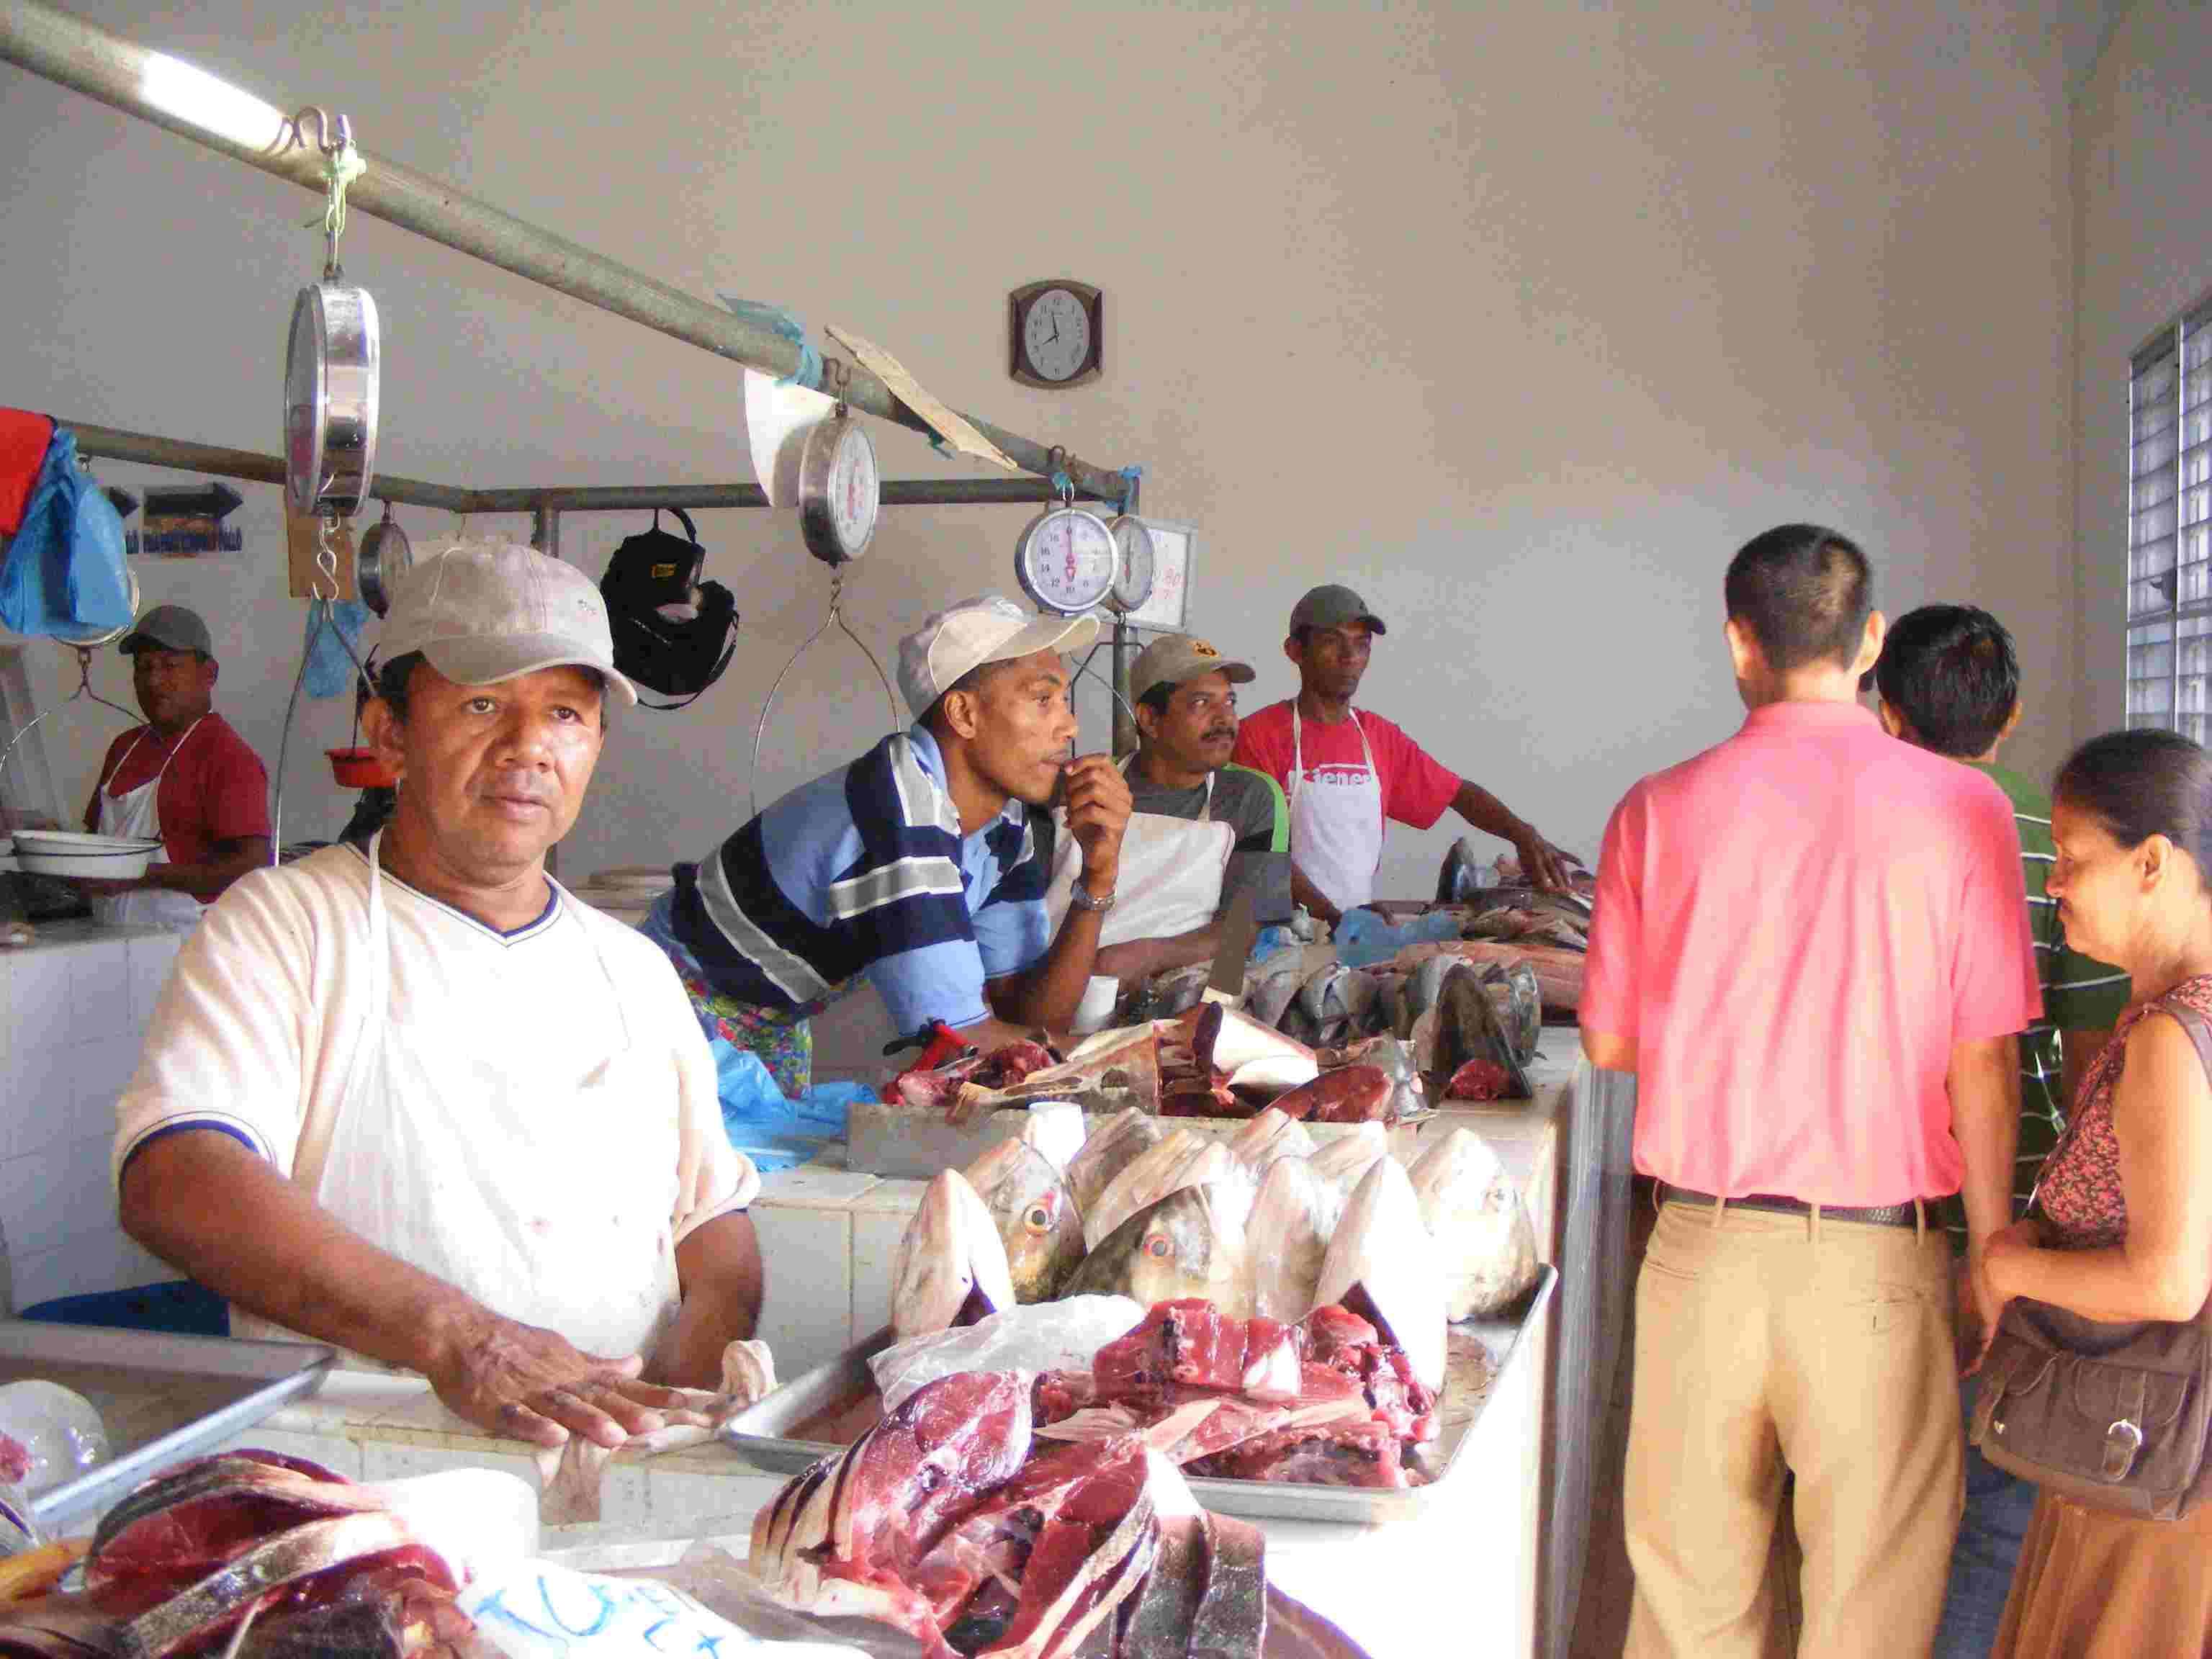 The Penonome fish market